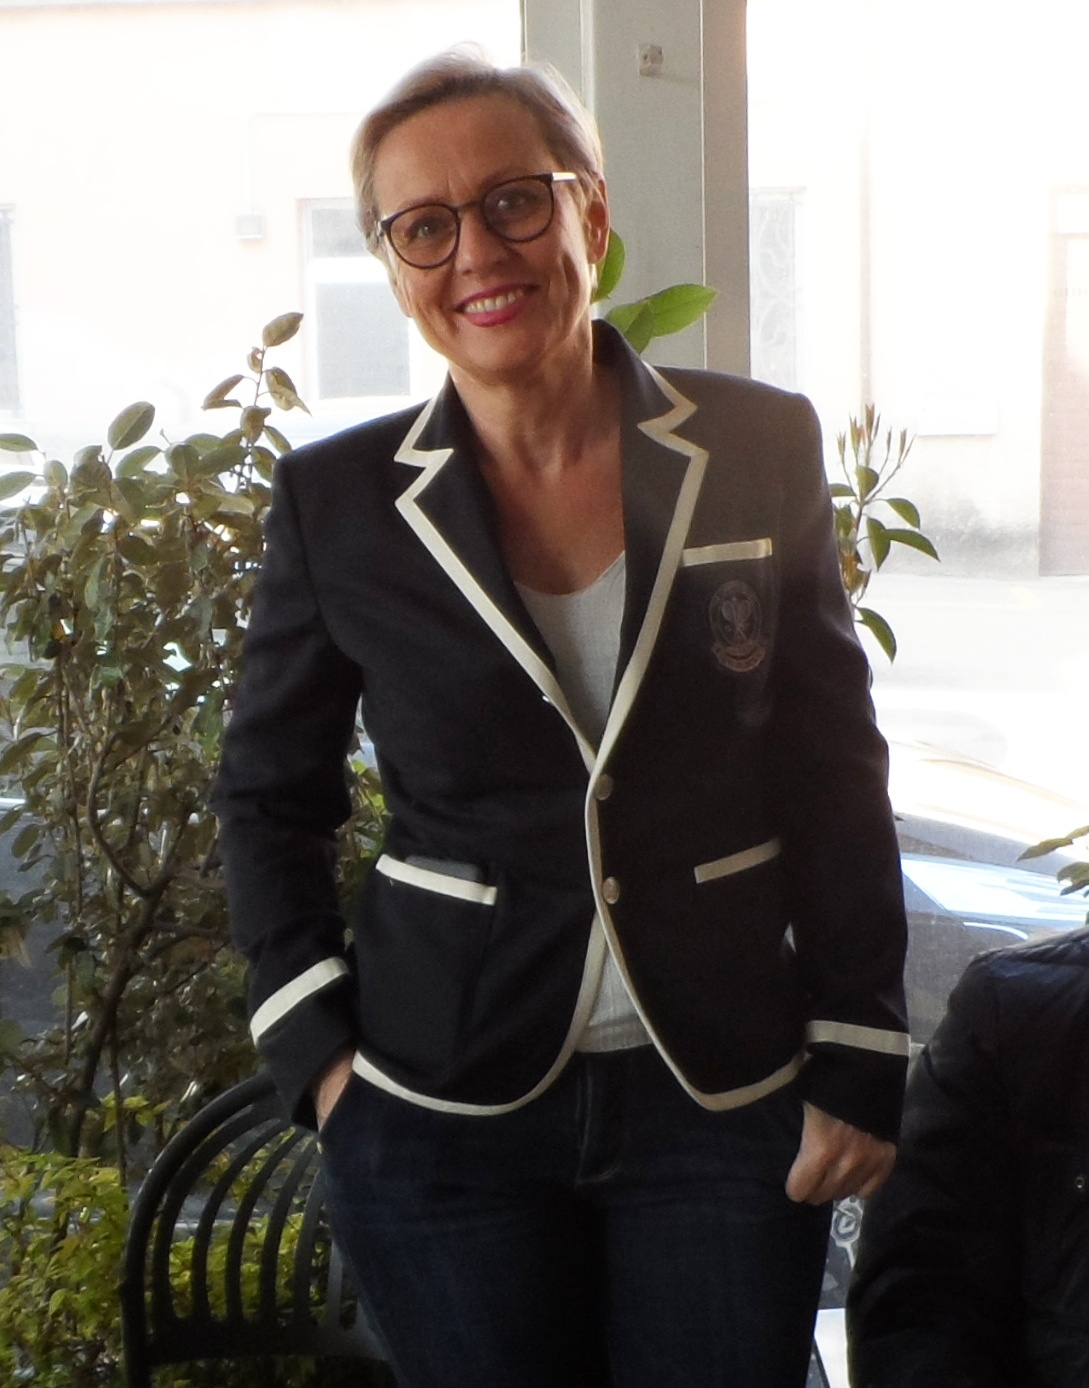 cristina-bacchi-lista-meldola-cè